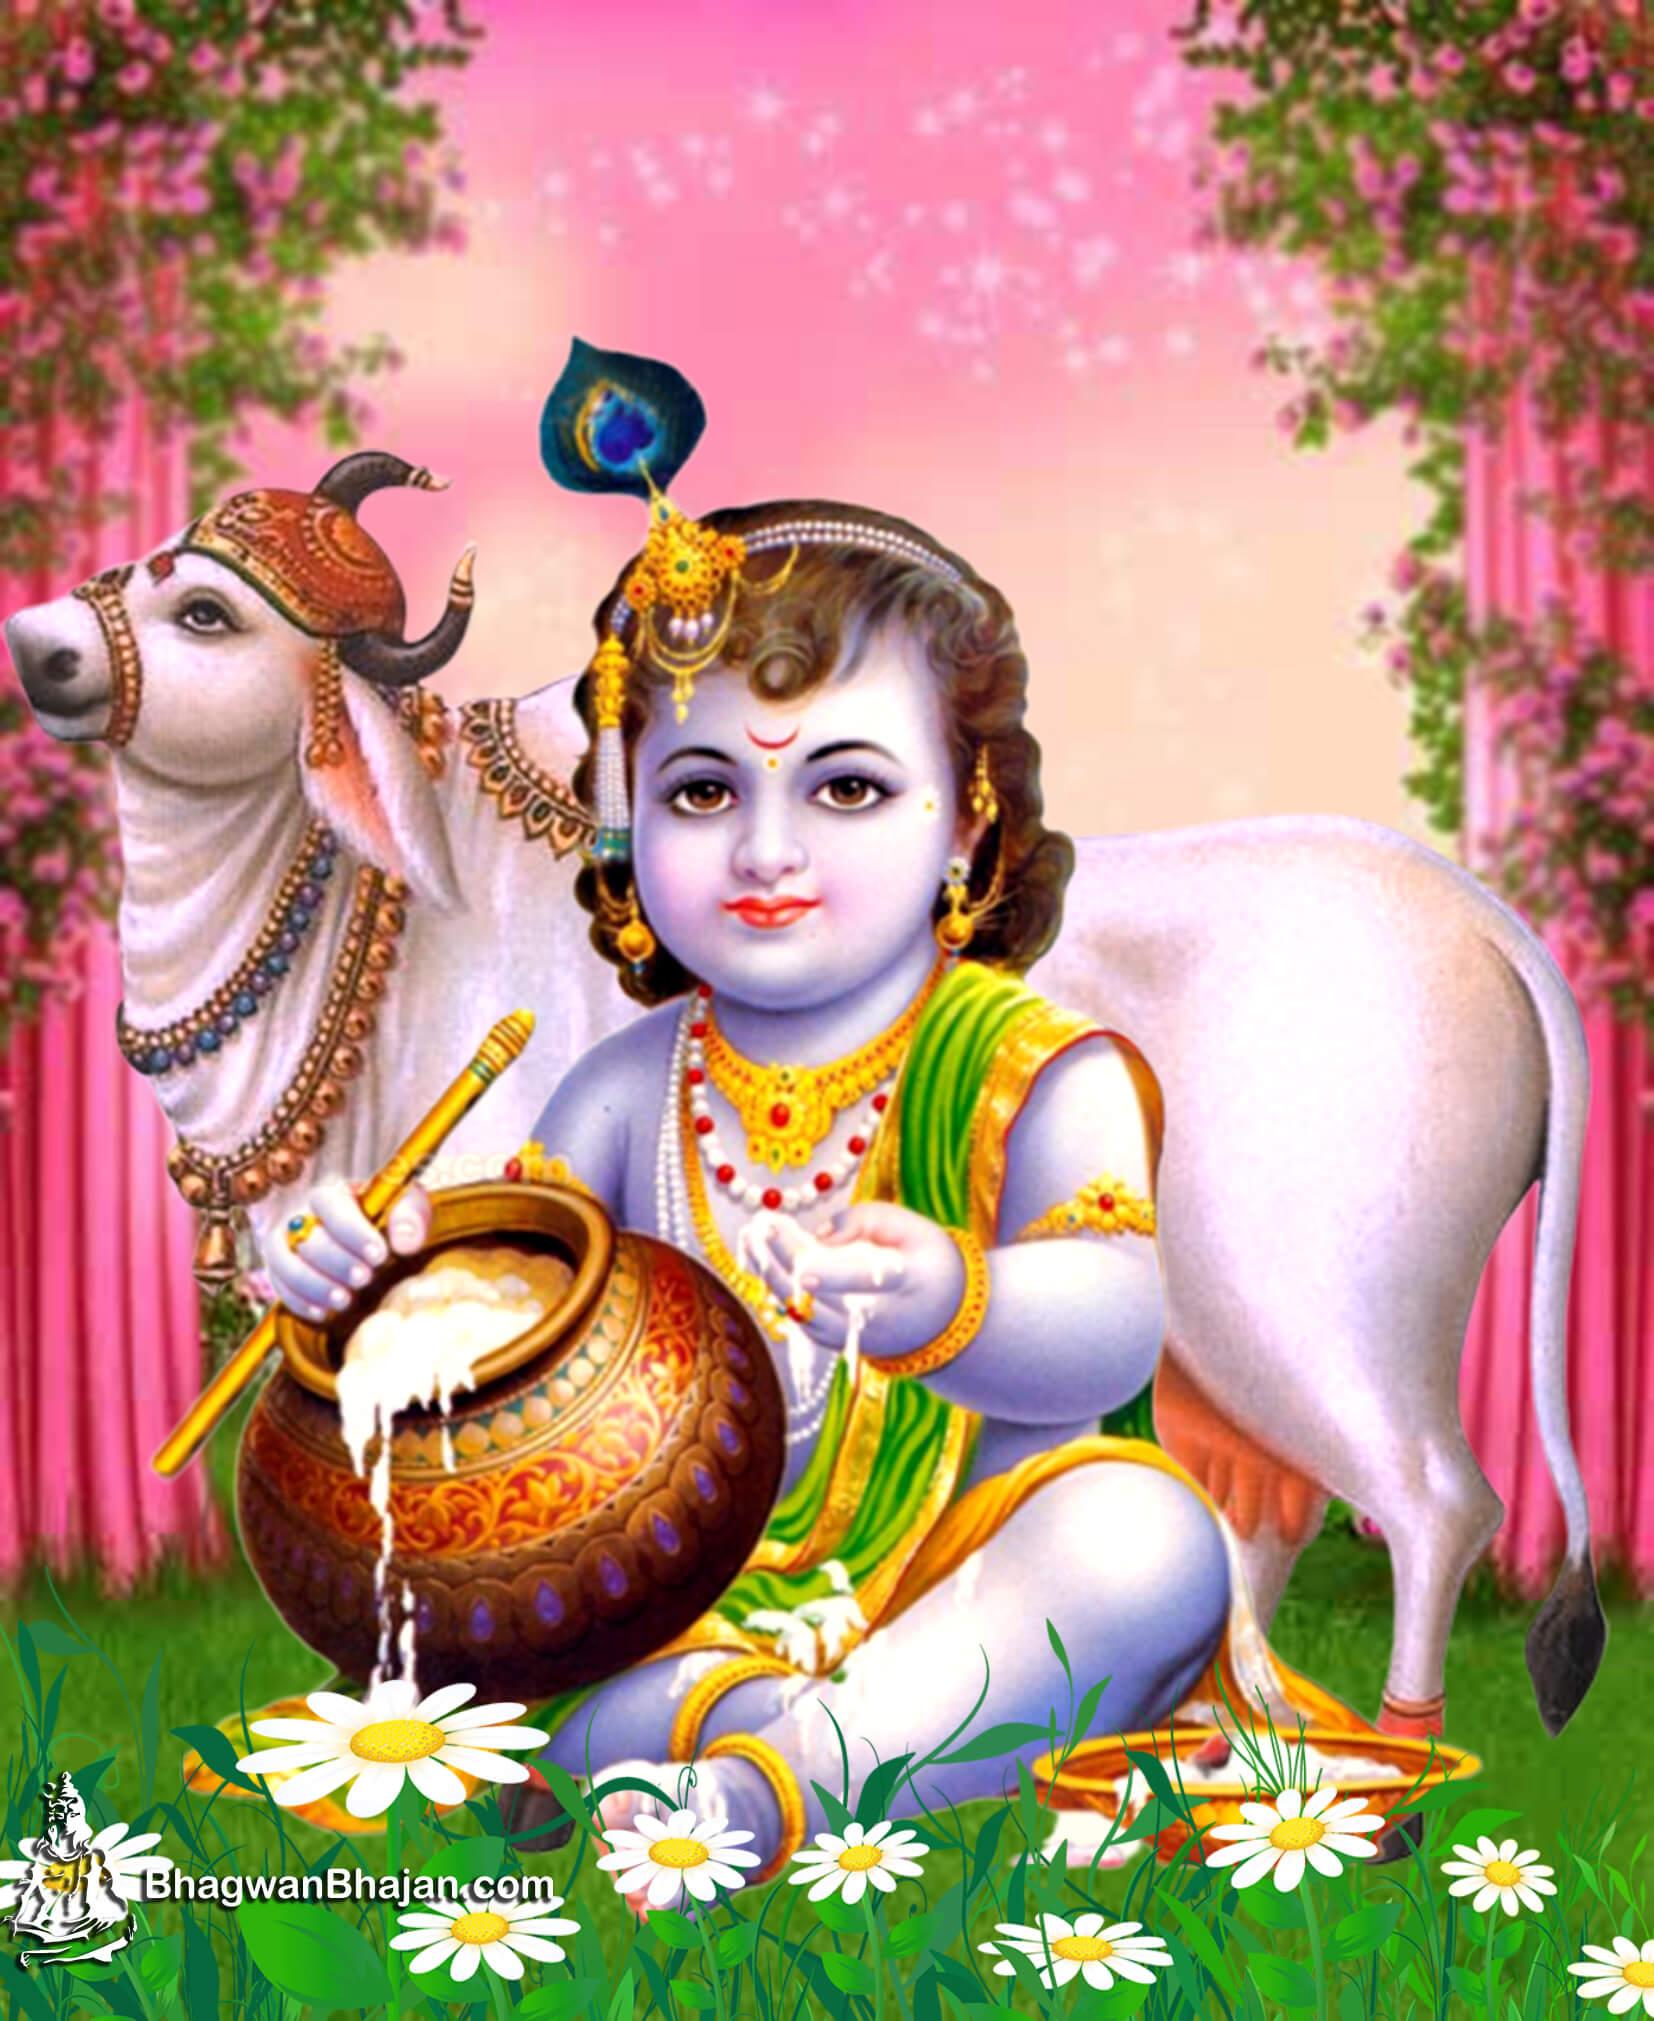 Bhagwan Shri Krishna Bal Roop HD Image